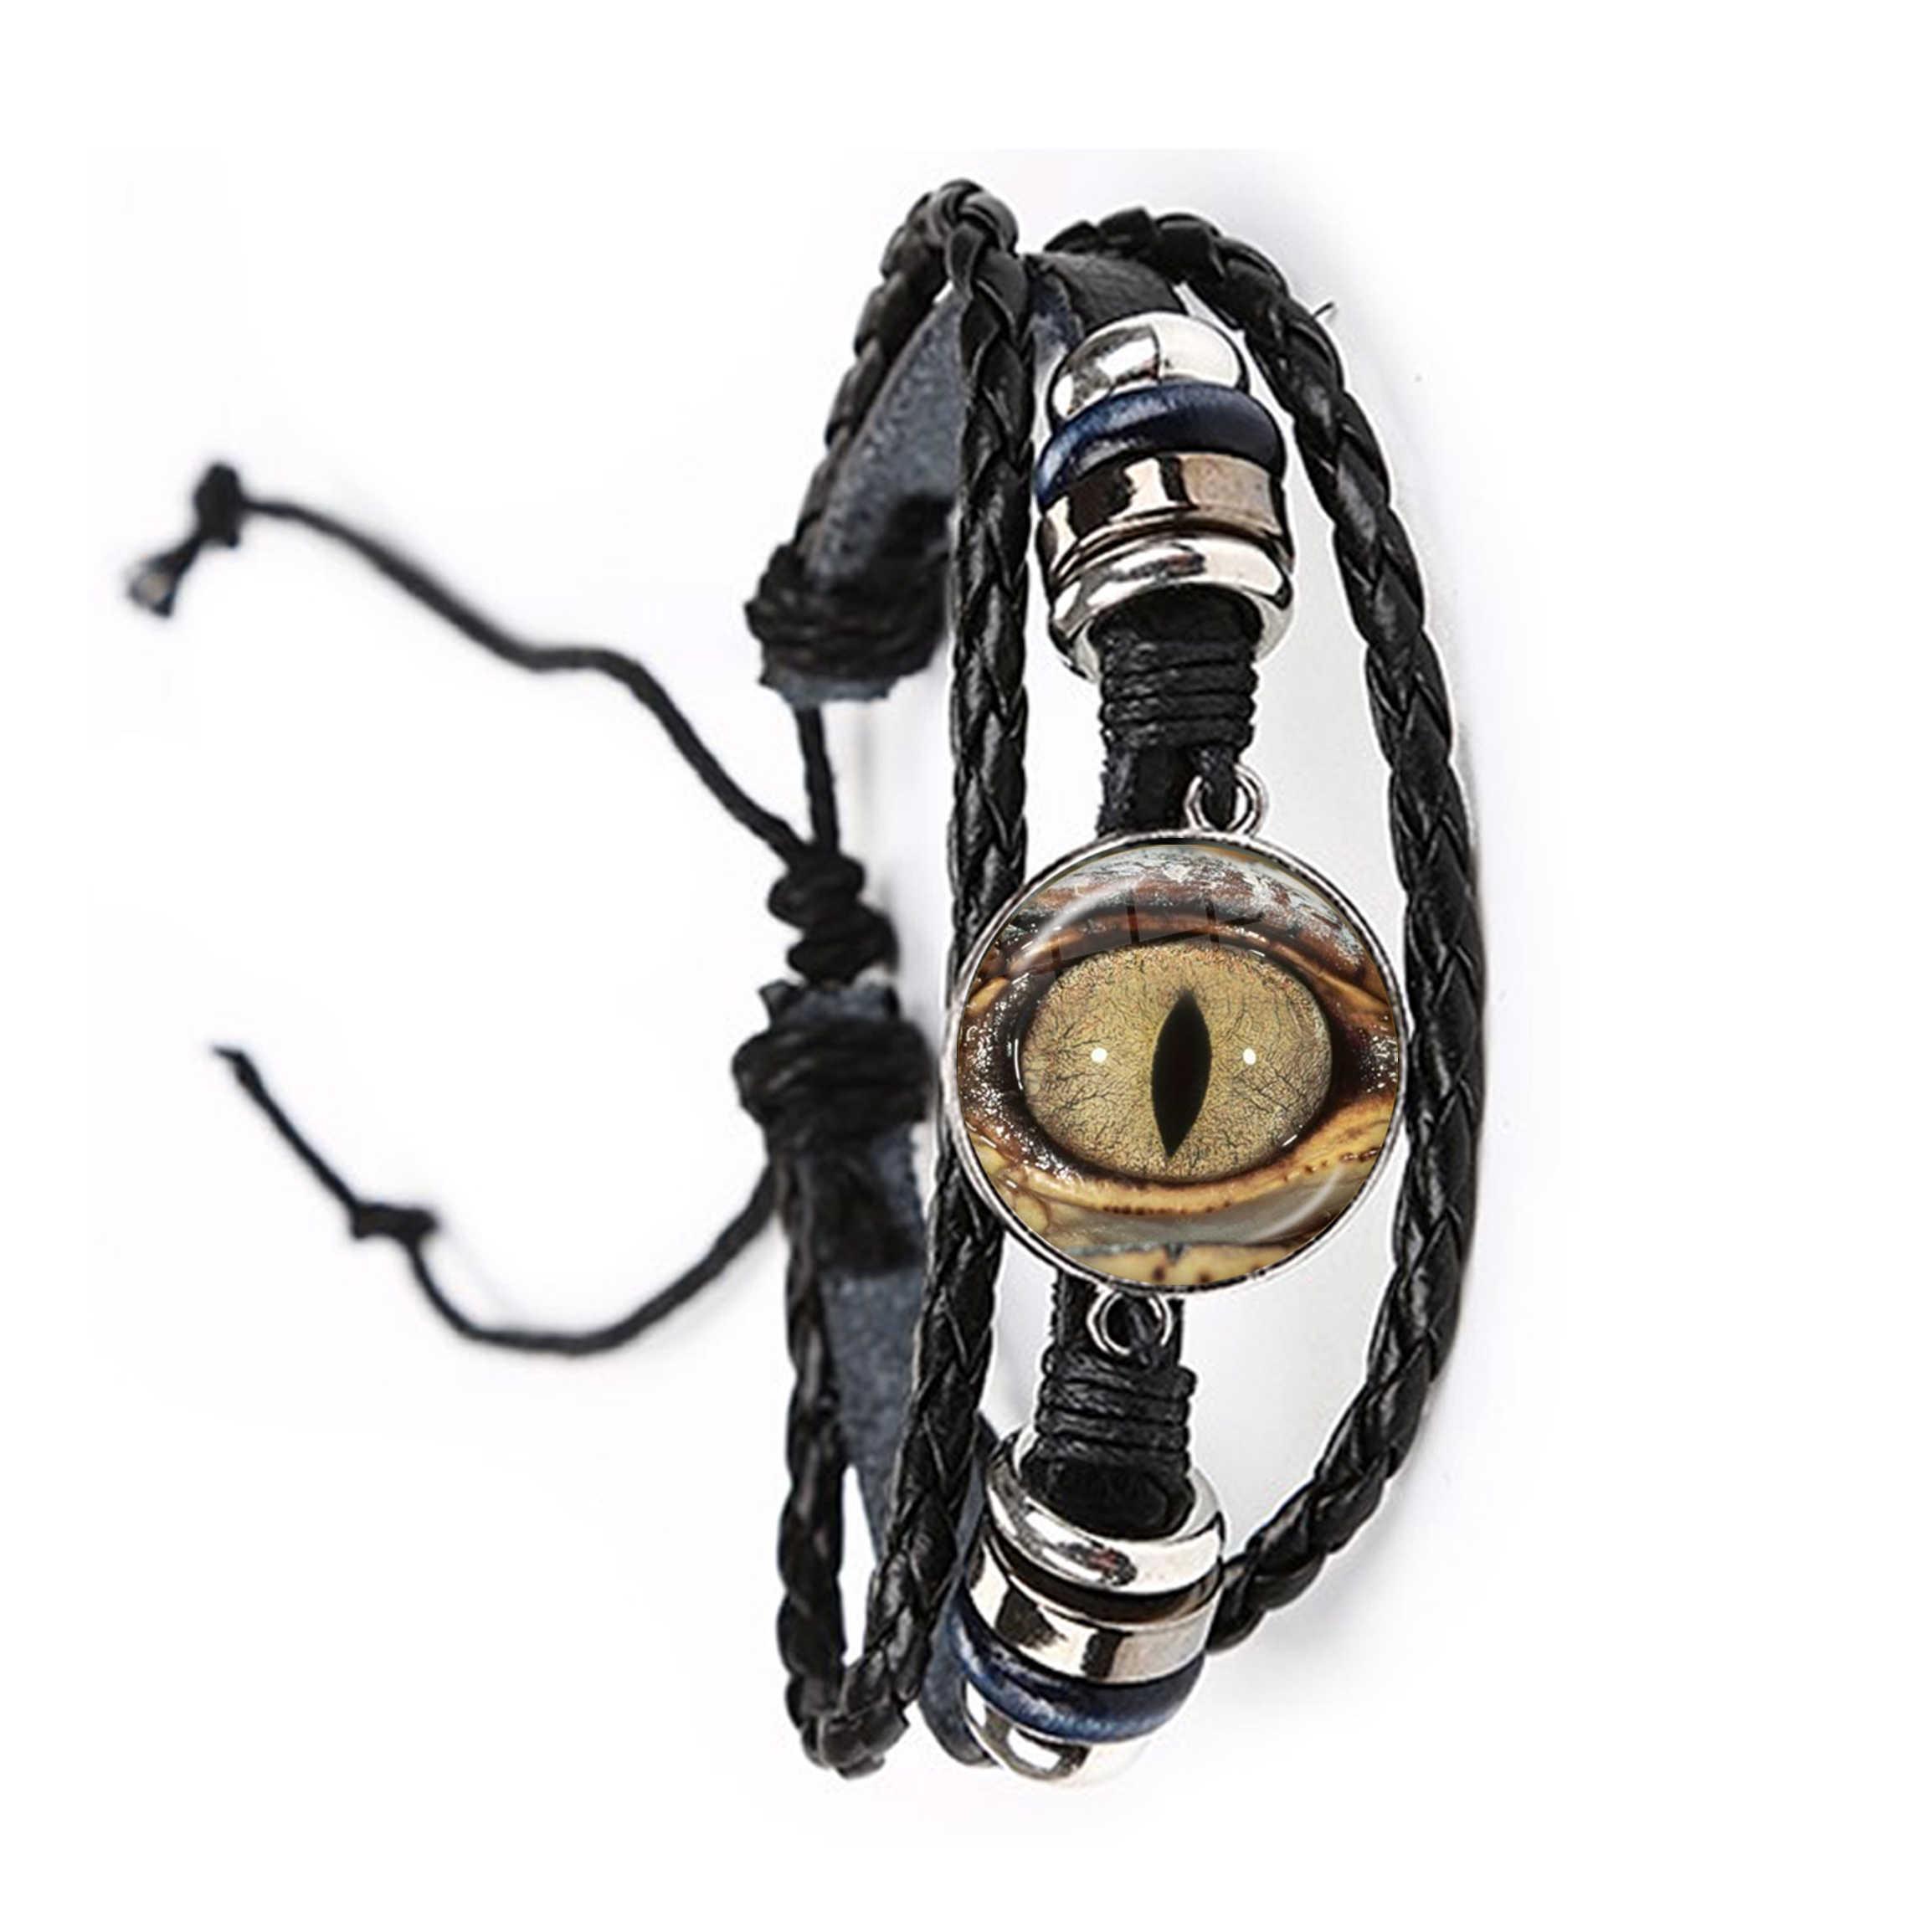 Animal Eyes Dragon Snake Owl Cat Tiger Eyes 20mm Glass Cabochon Bracelet Handmade Jewelry Leather Bangle For Women Men Gift